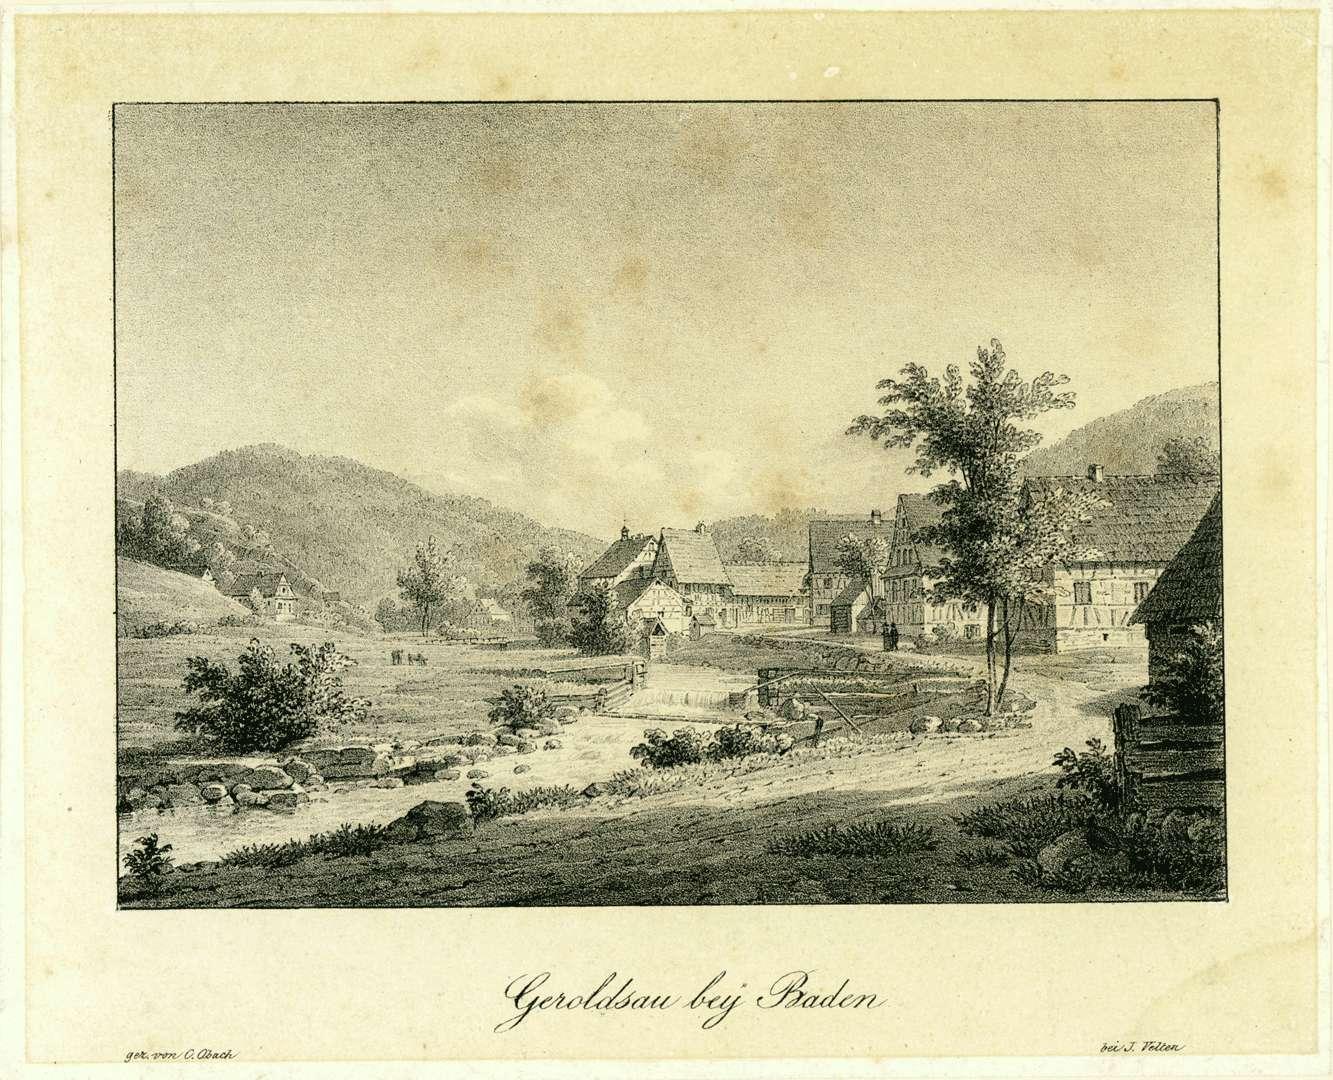 Geroldsau bey Baden, Bild 1